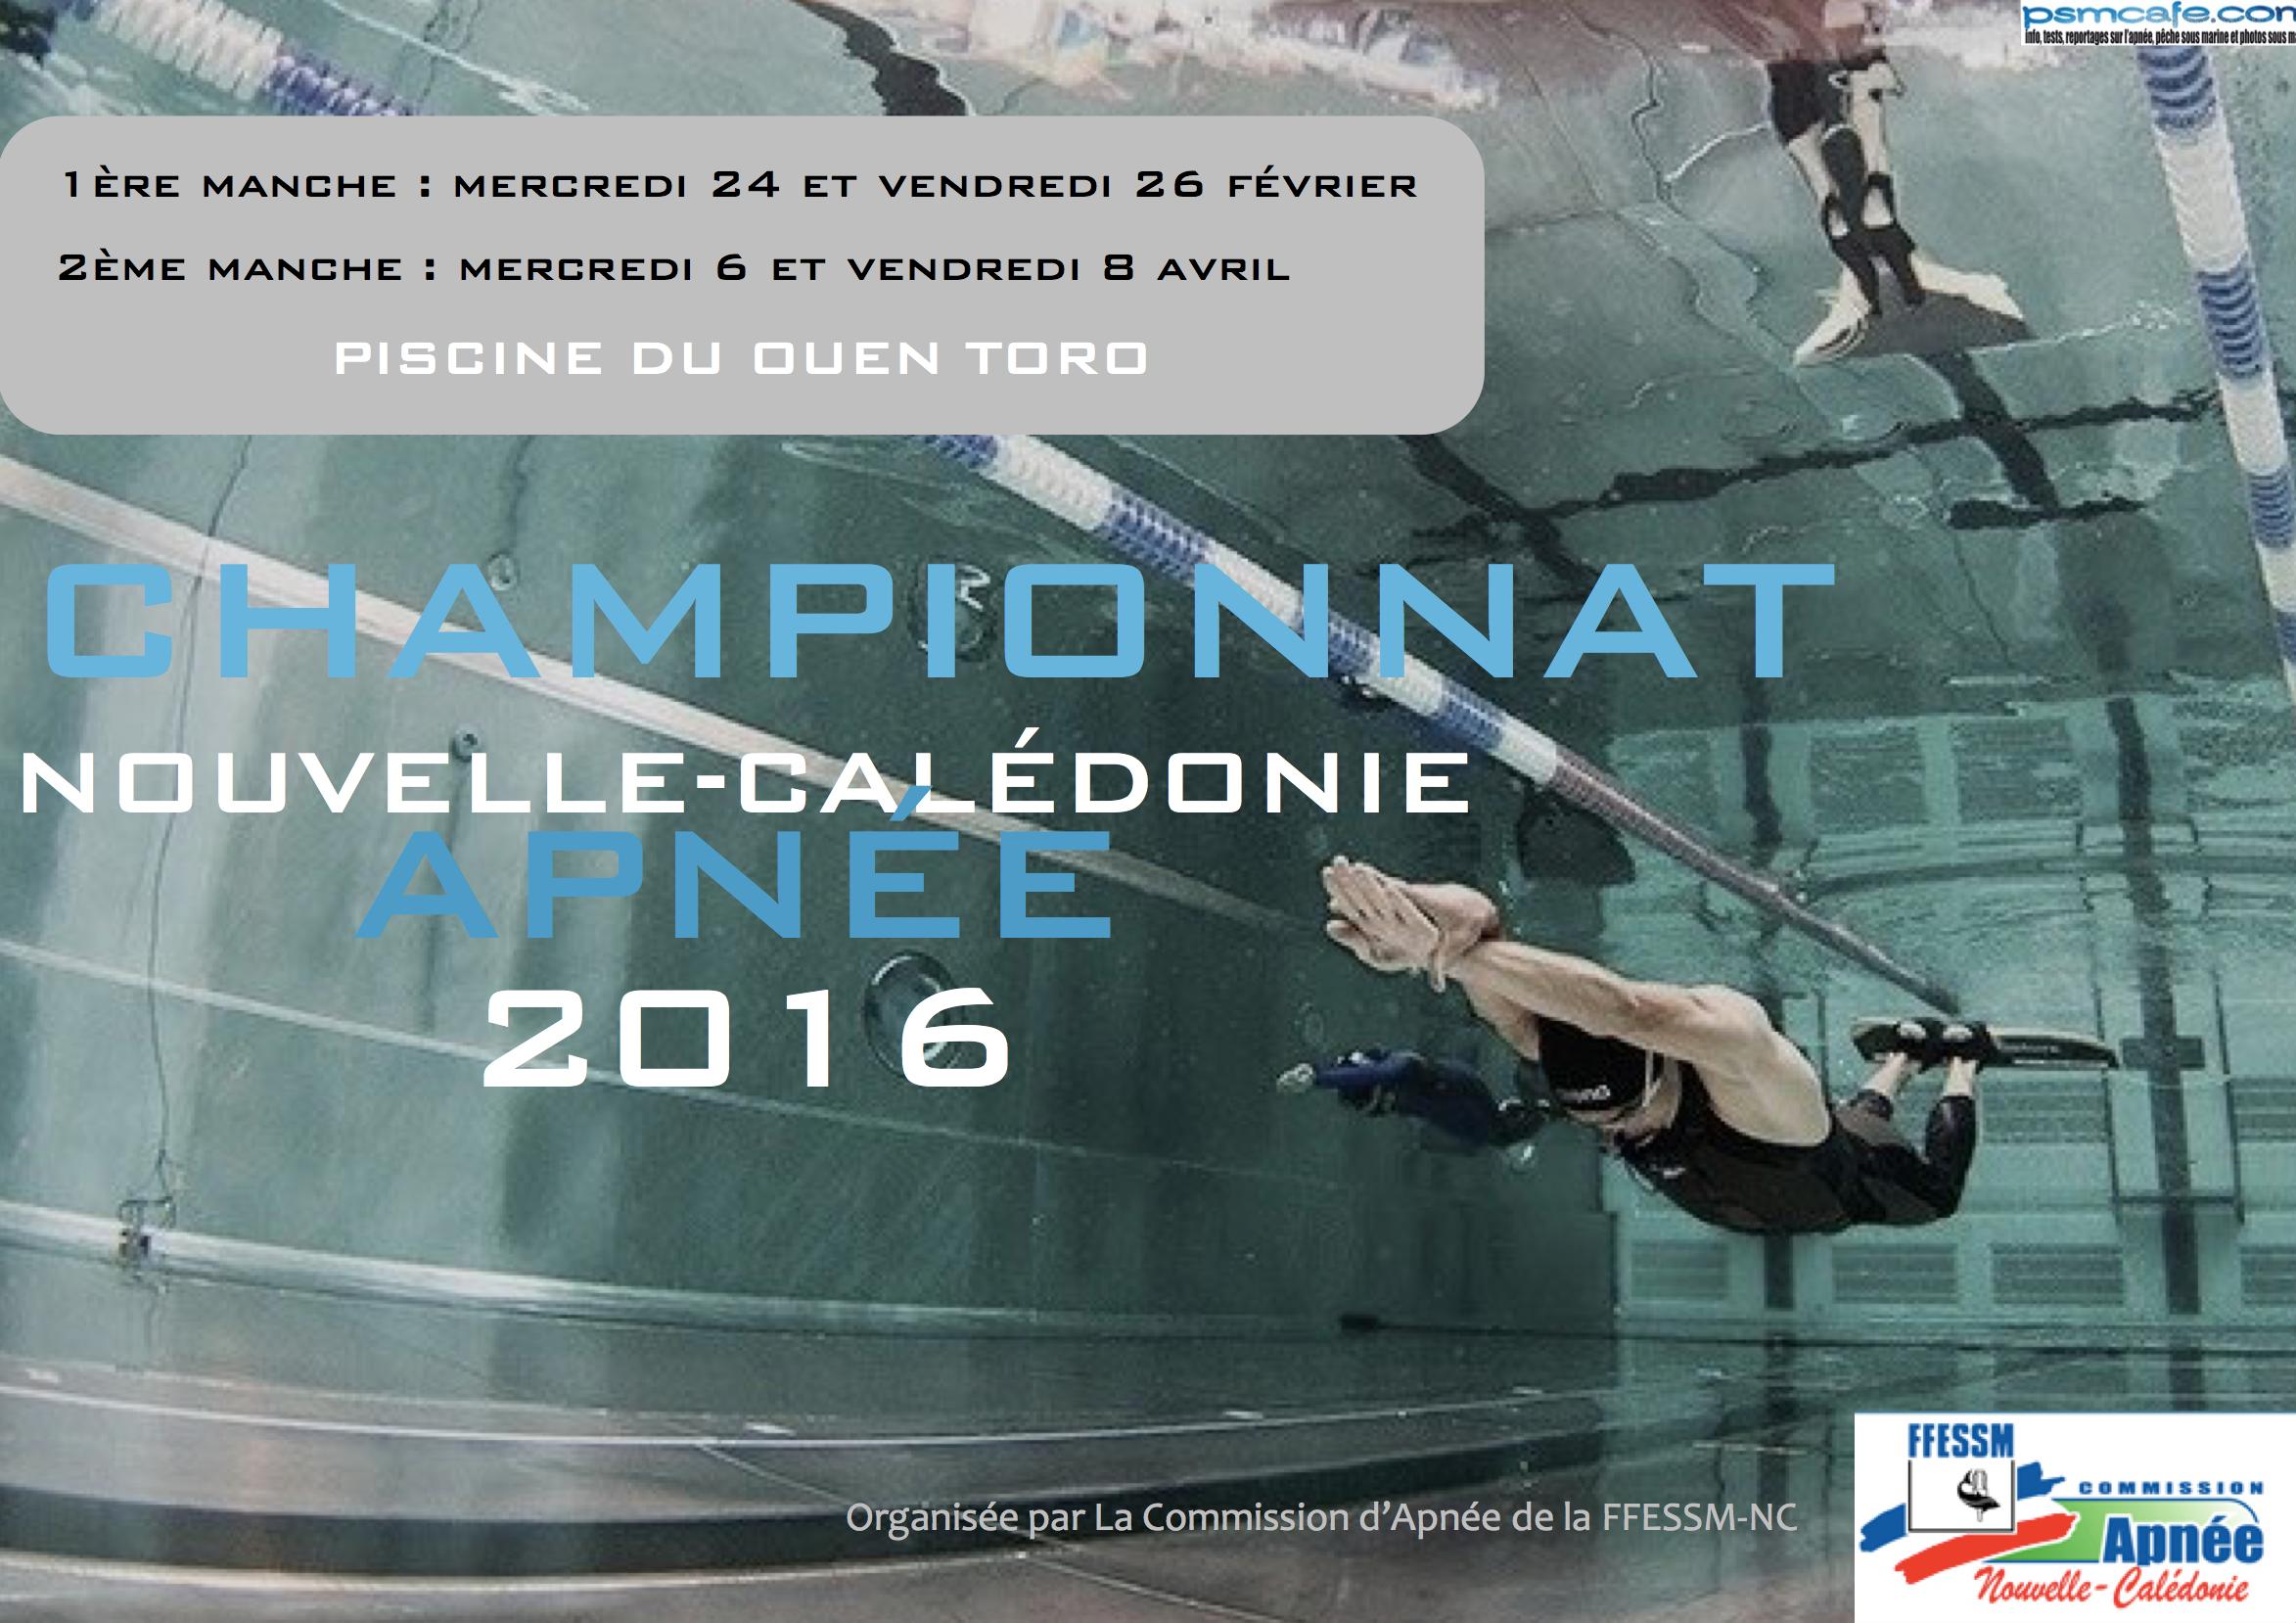 Chanpionnat Apnee NC 2016